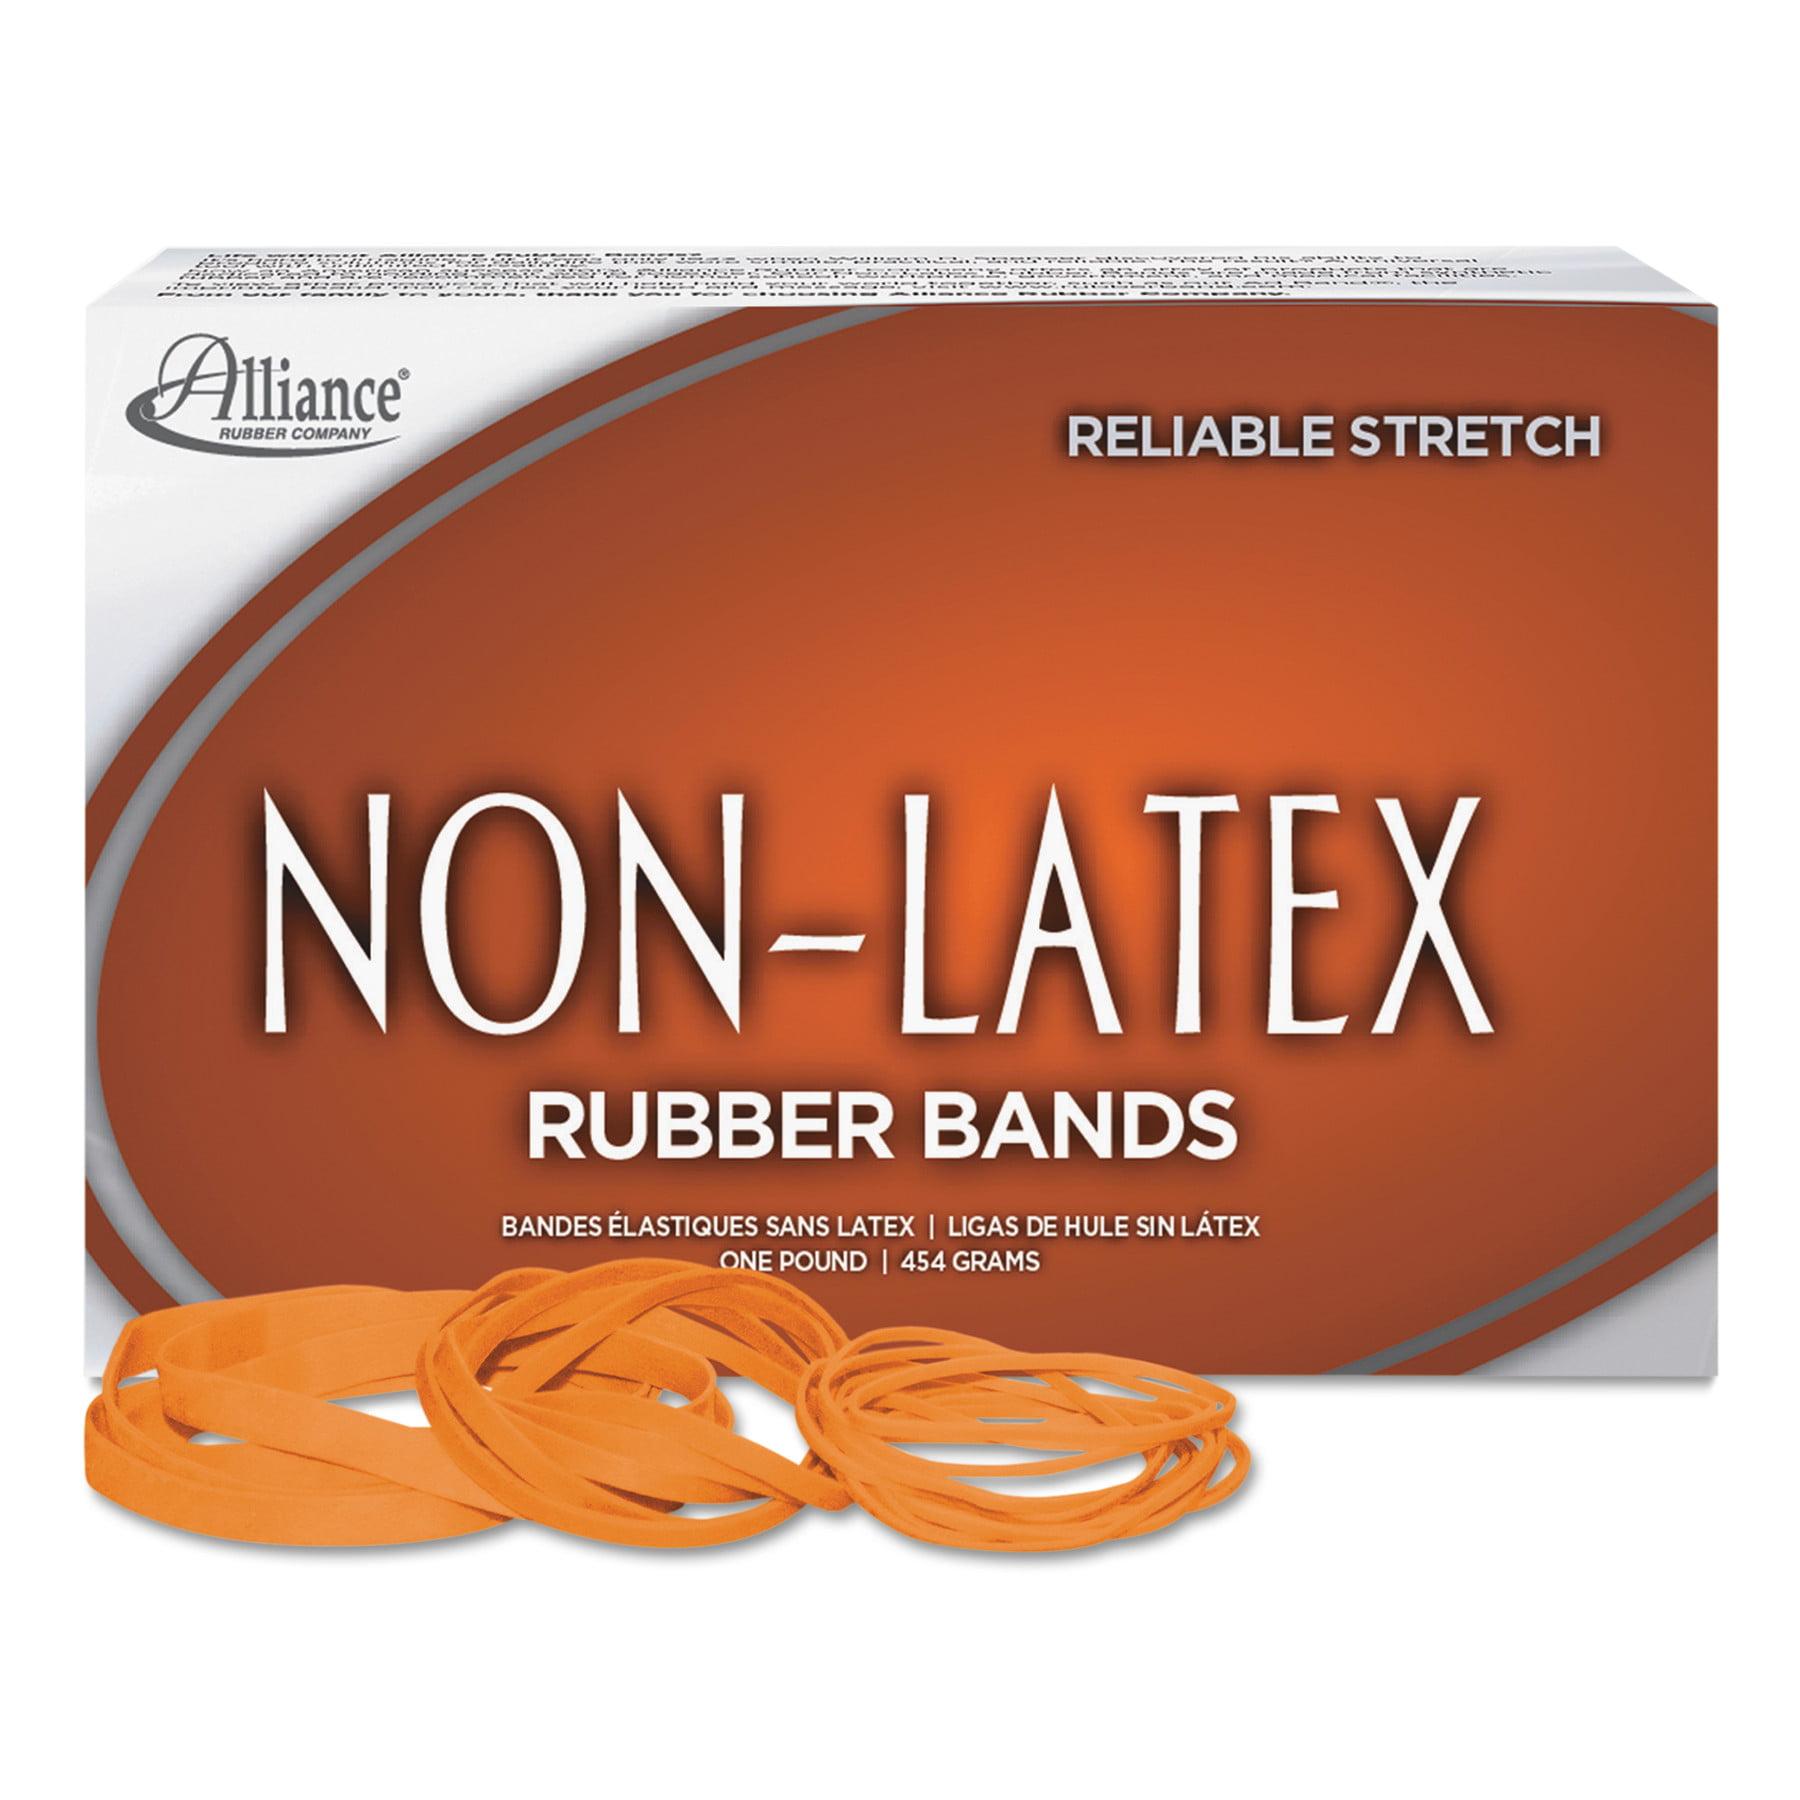 Alliance Non-Latex Rubber Bands, Sz. 64, Orange, 3 1/2 x 1/4, 380 Bands/1lb Box -ALL37646